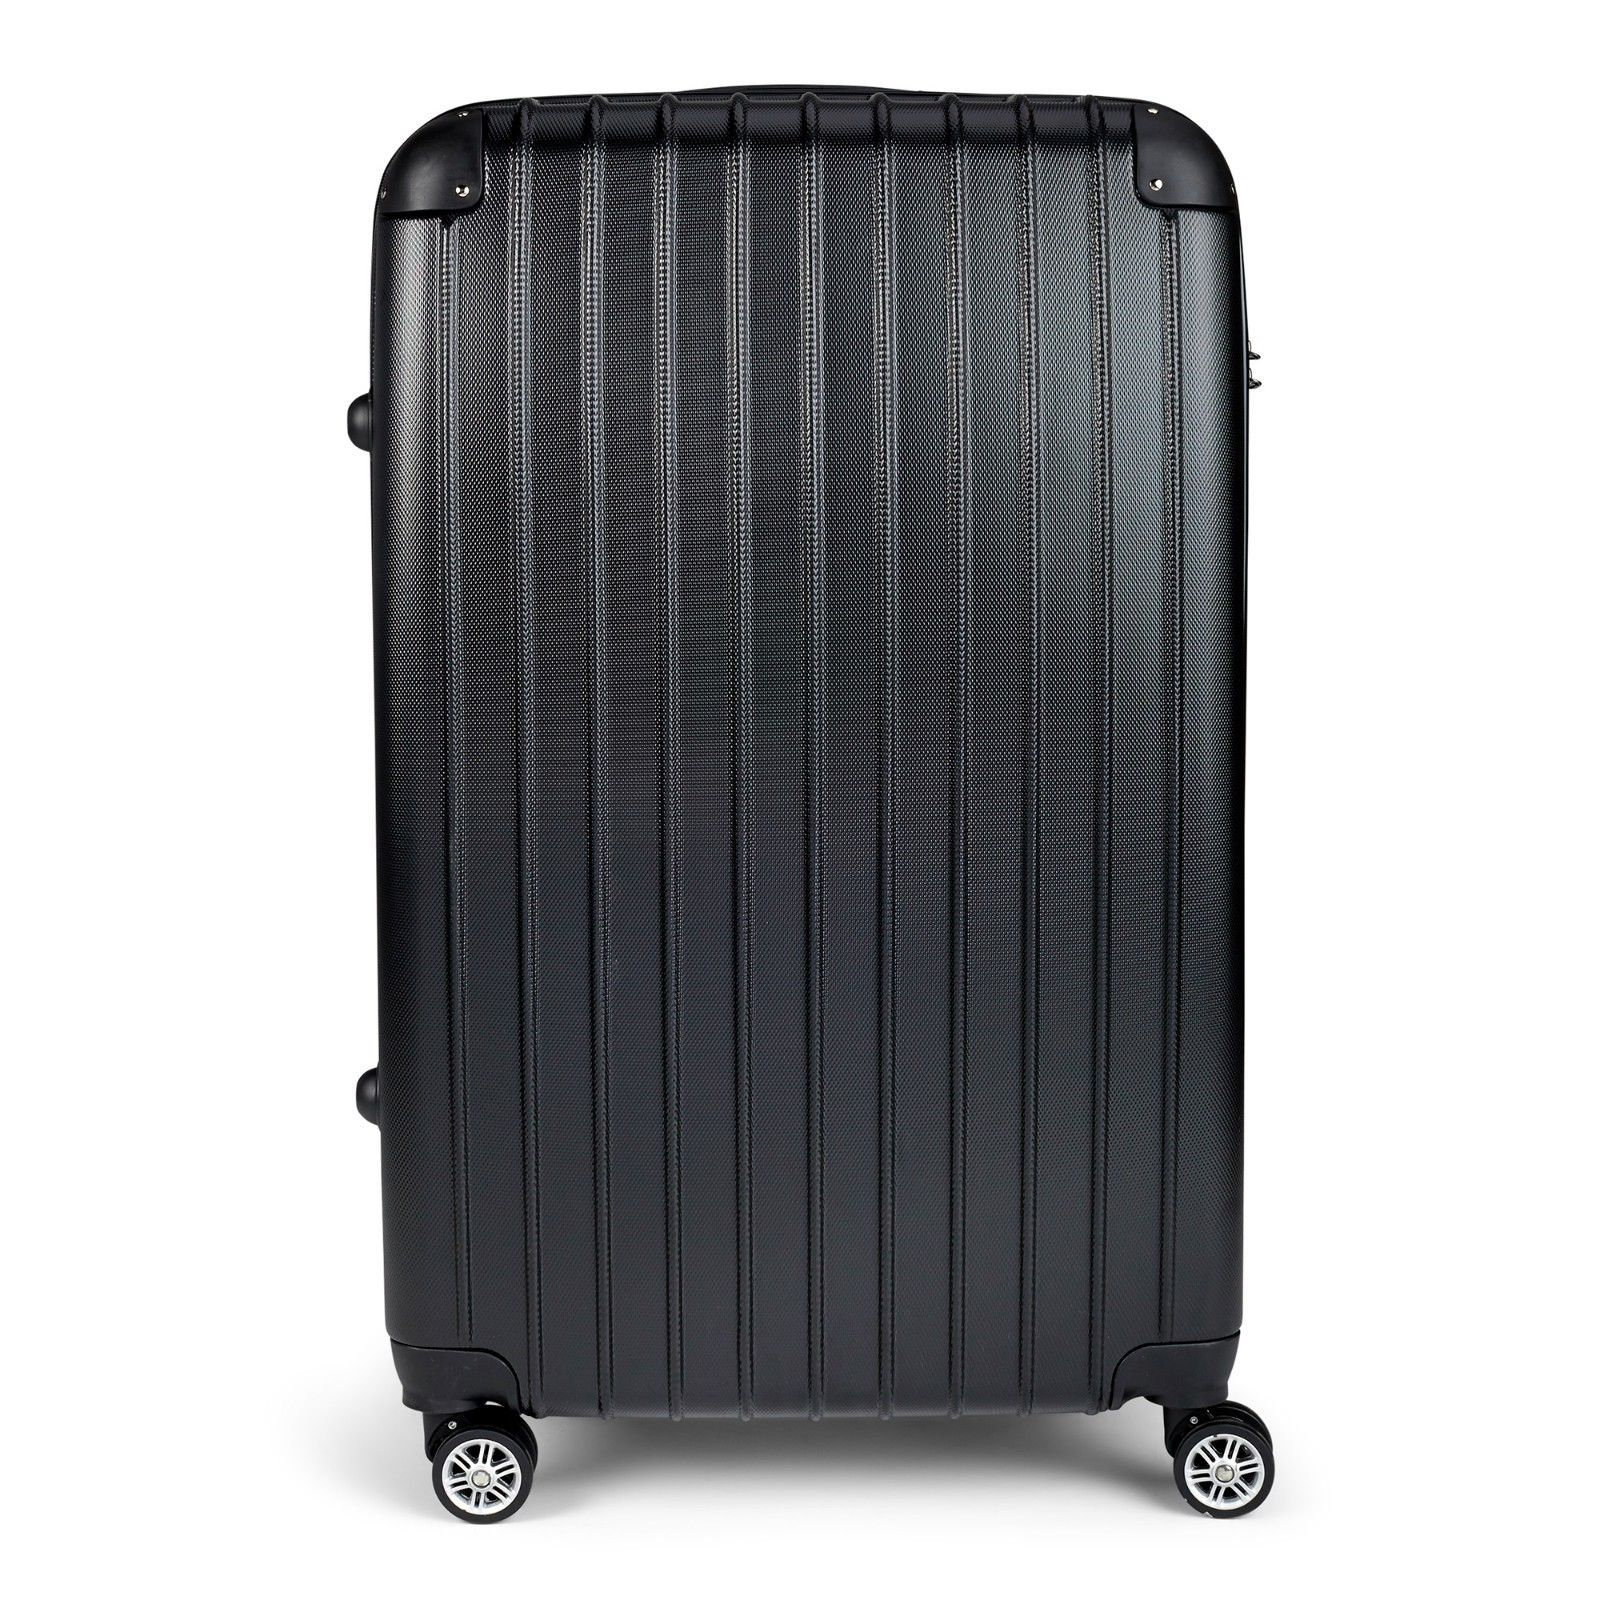 Milano-Premium-3pc-ABS-Luggage-Suitcase-Luxury-Hard-Case-Shockproof-Travel-Set thumbnail 6